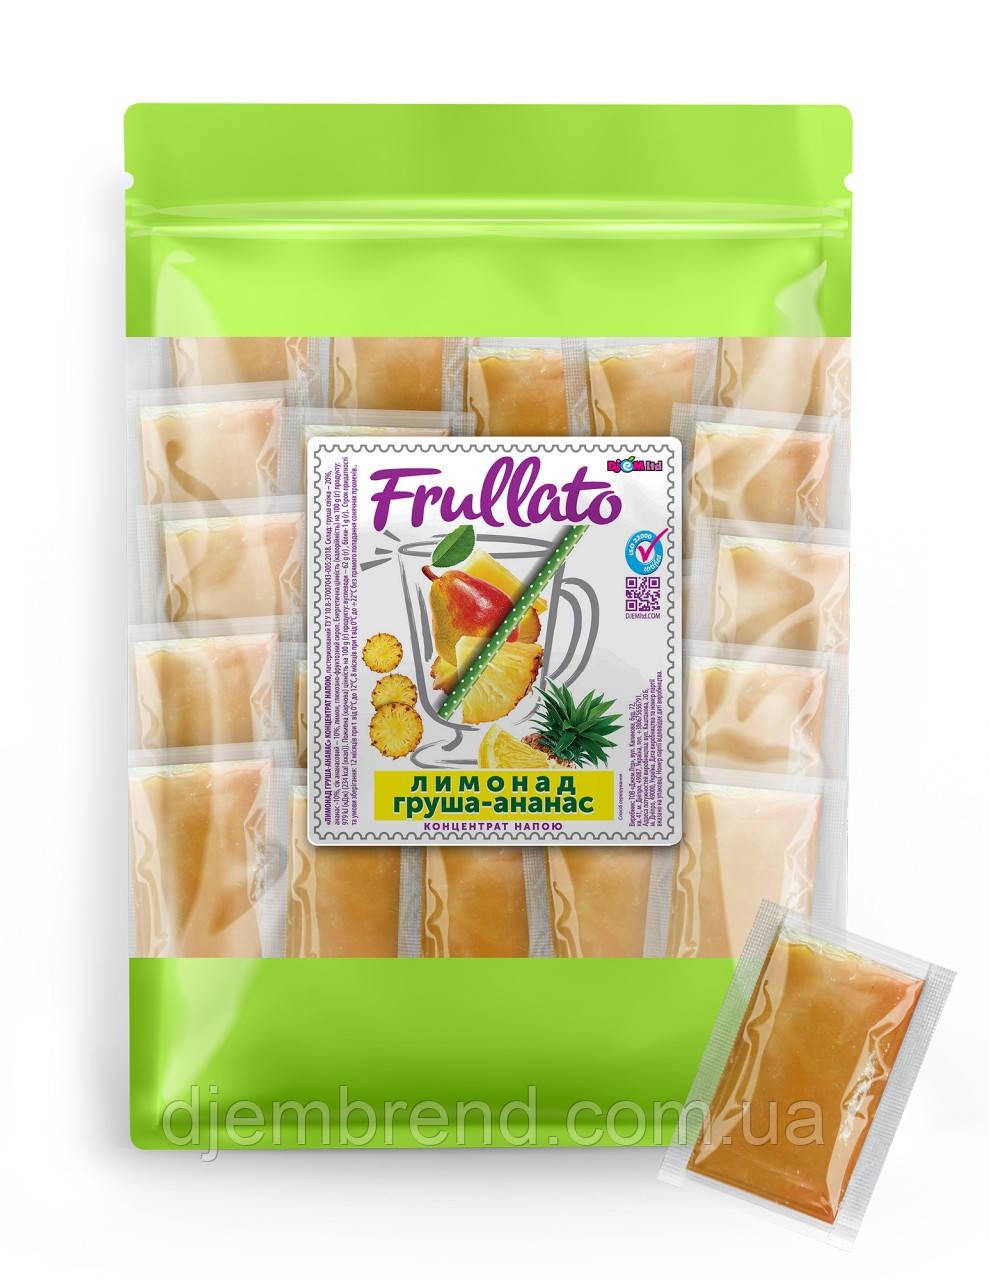 Лимонад груша-ананас Frullato натуральный, 50 шт х 40 г